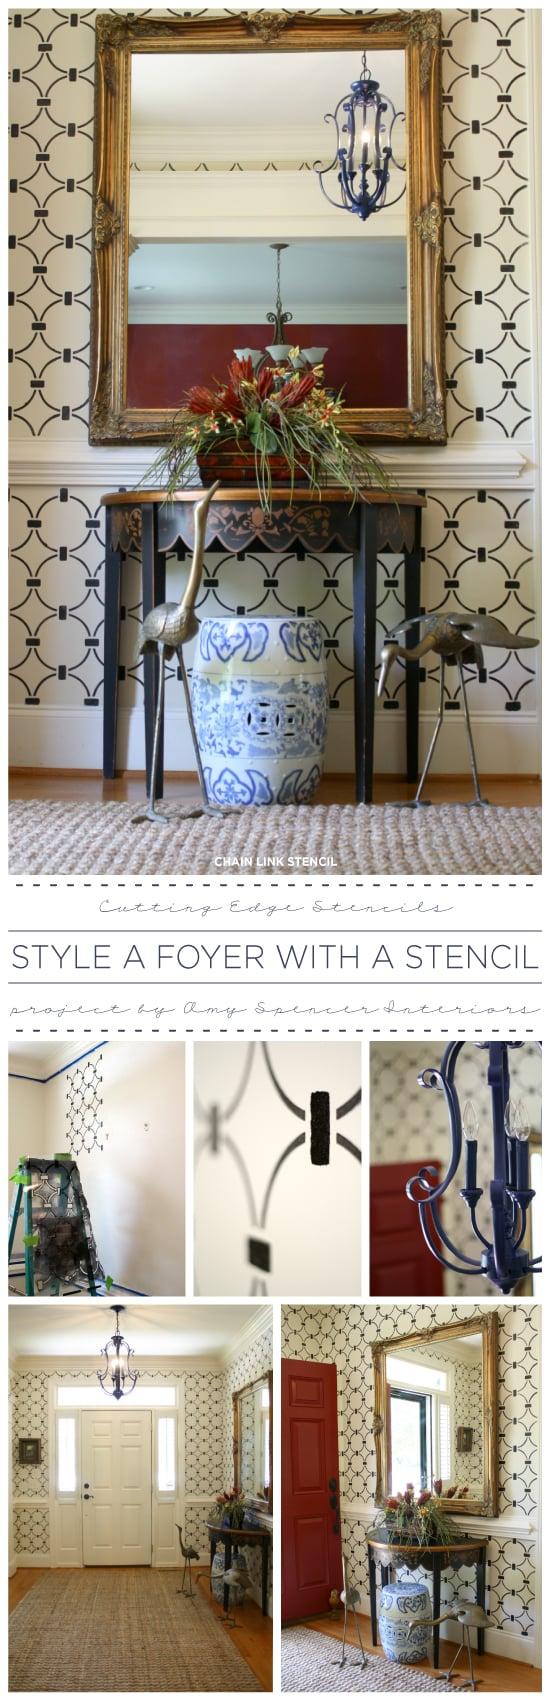 A DIY stenciled foyer using the Chain Link Allover stencil pattern. http://www.cuttingedgestencils.com/link-stencil-pattern.html